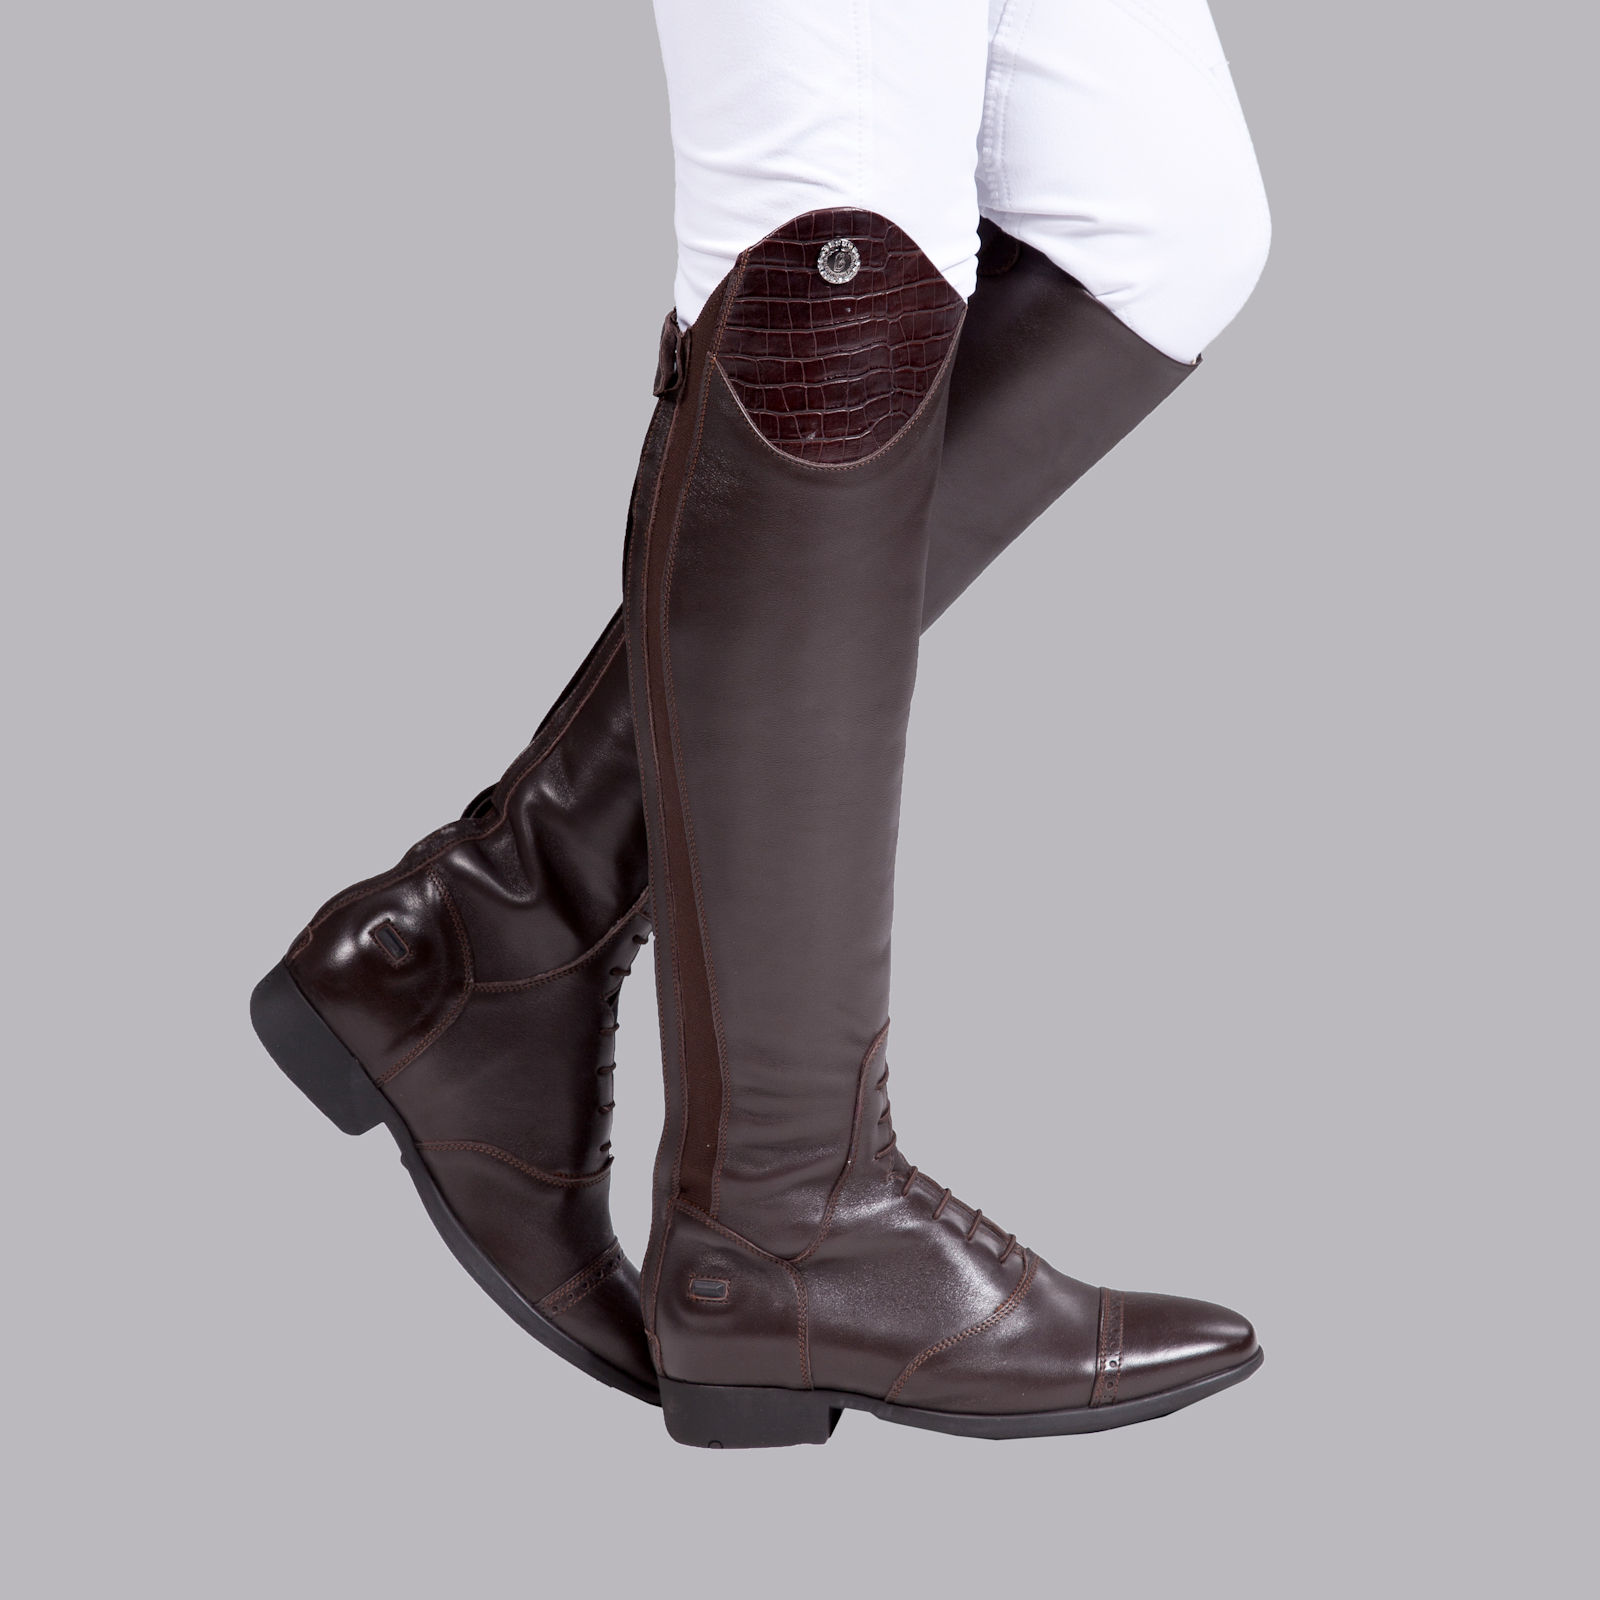 B Vertigo Jessie High Gloss Boots With Croco Pattern